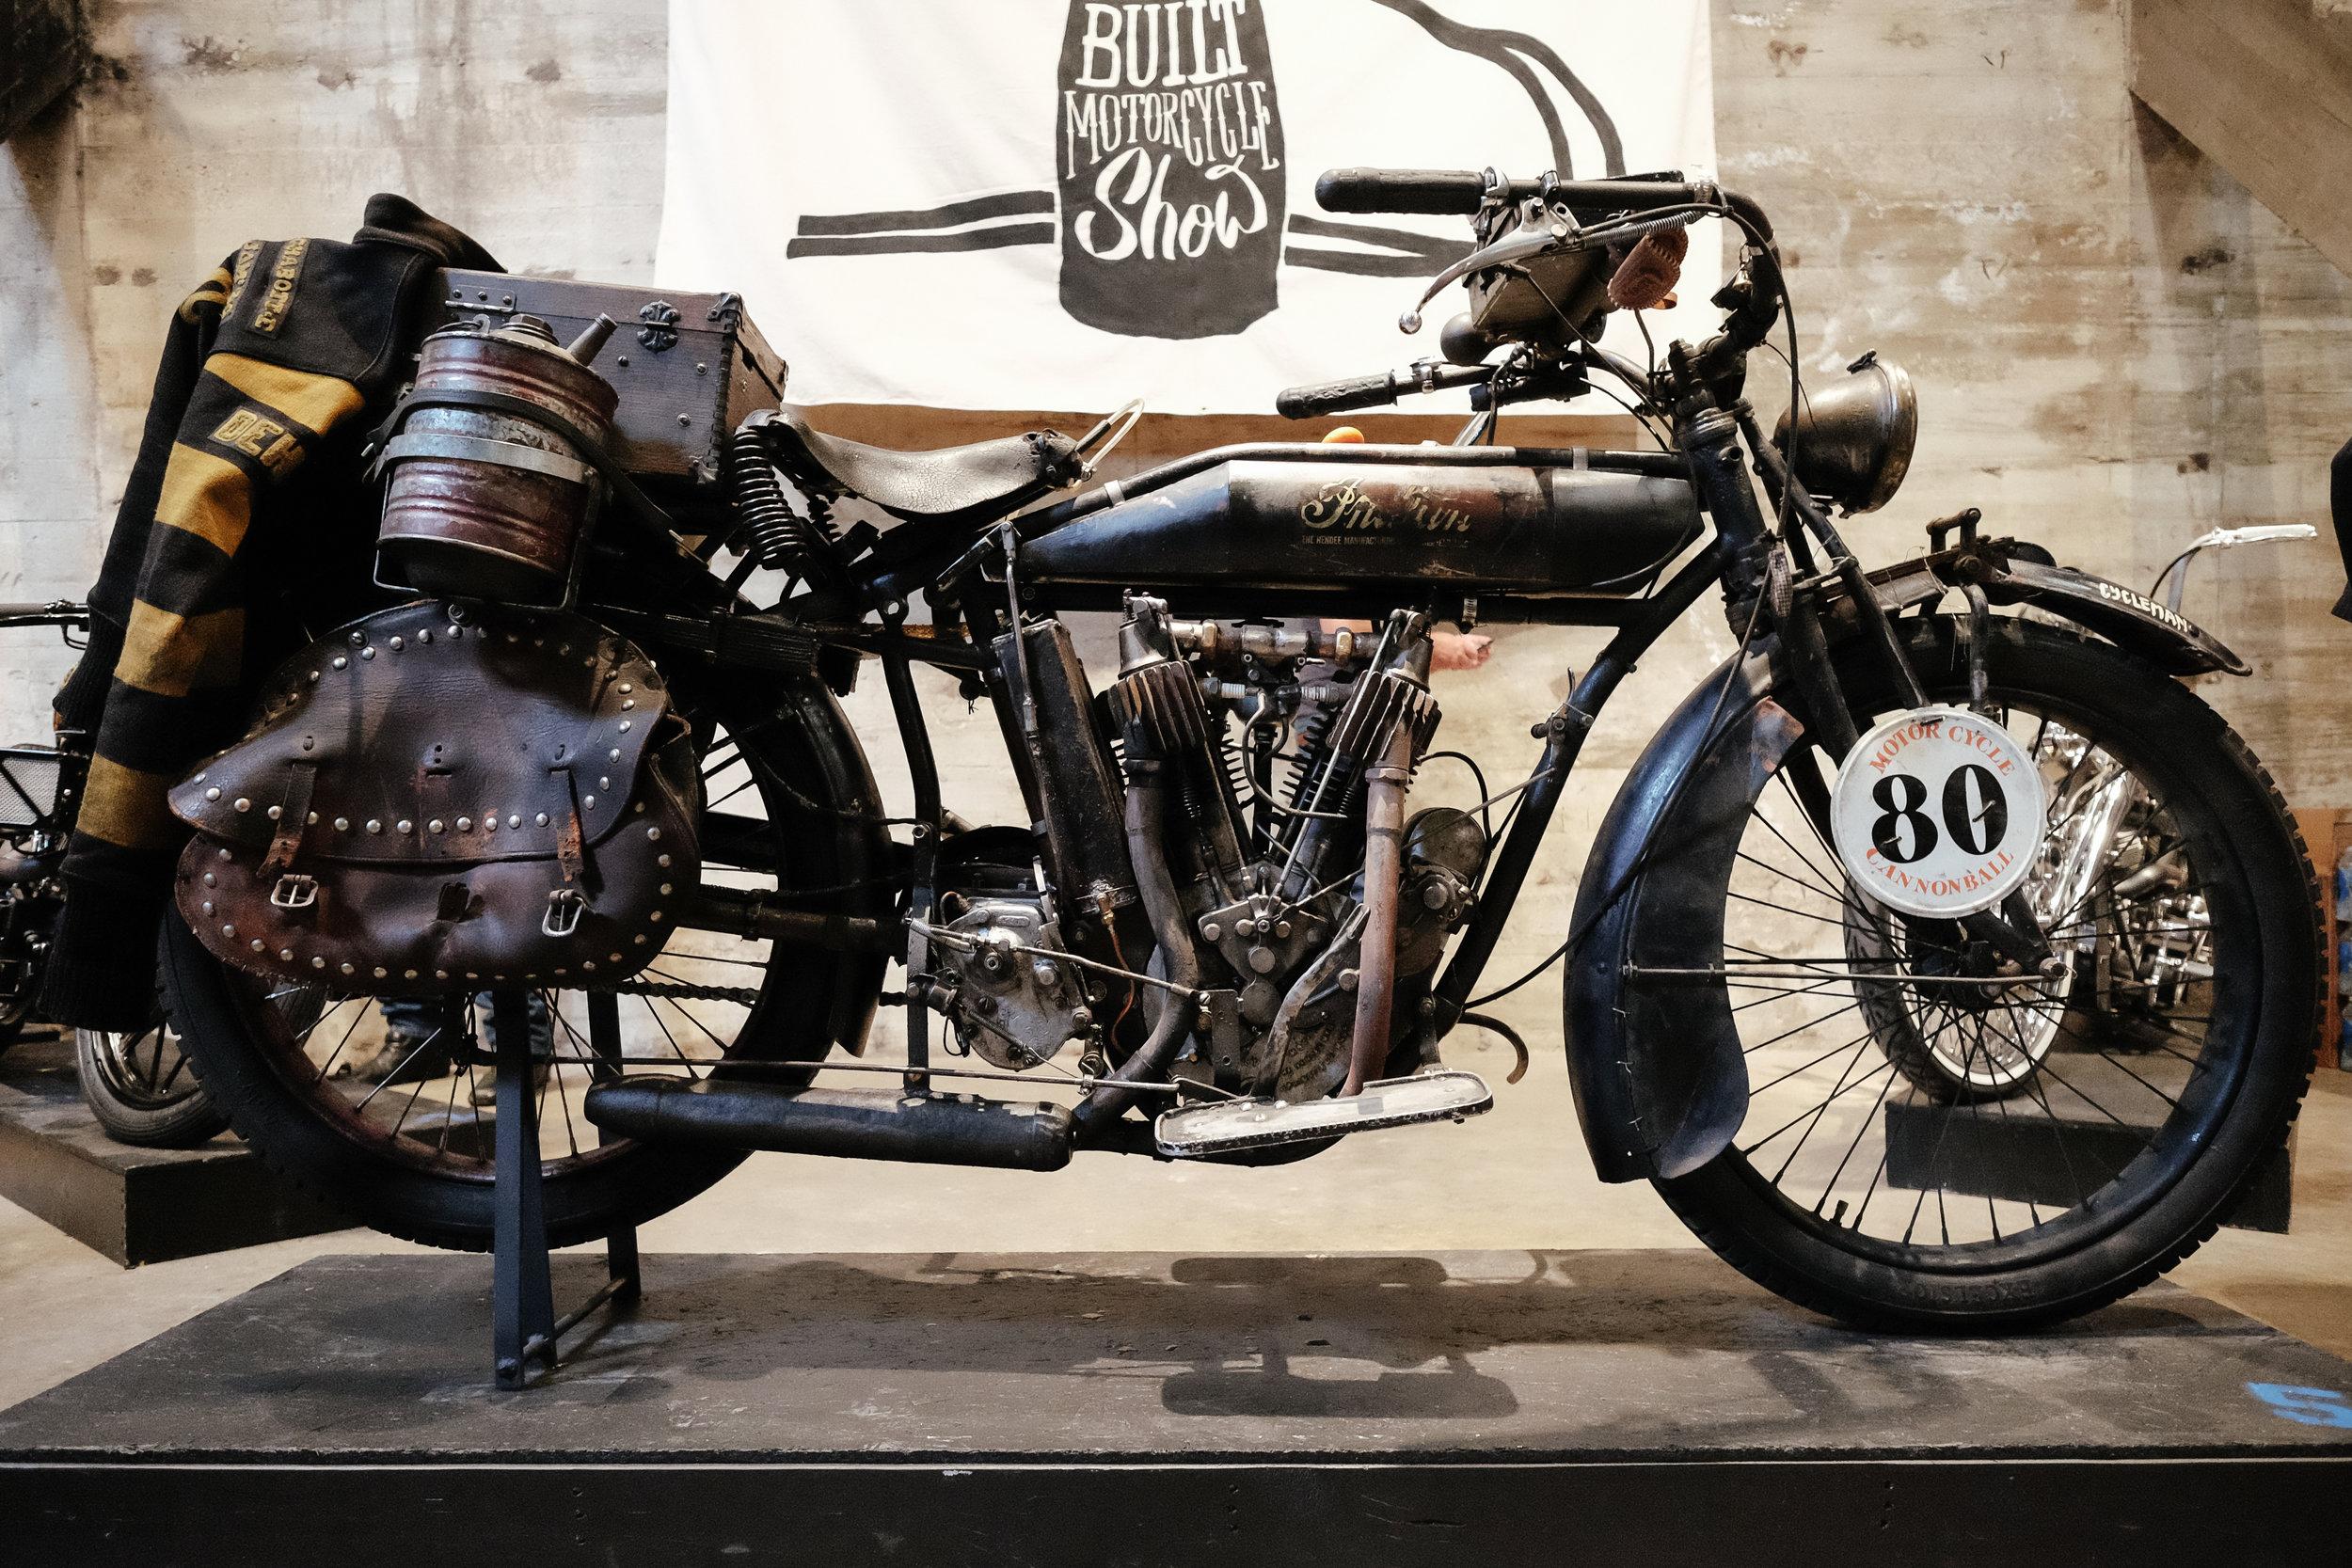 Handbuilt-Motorcycle-Show-2015-8017.jpg